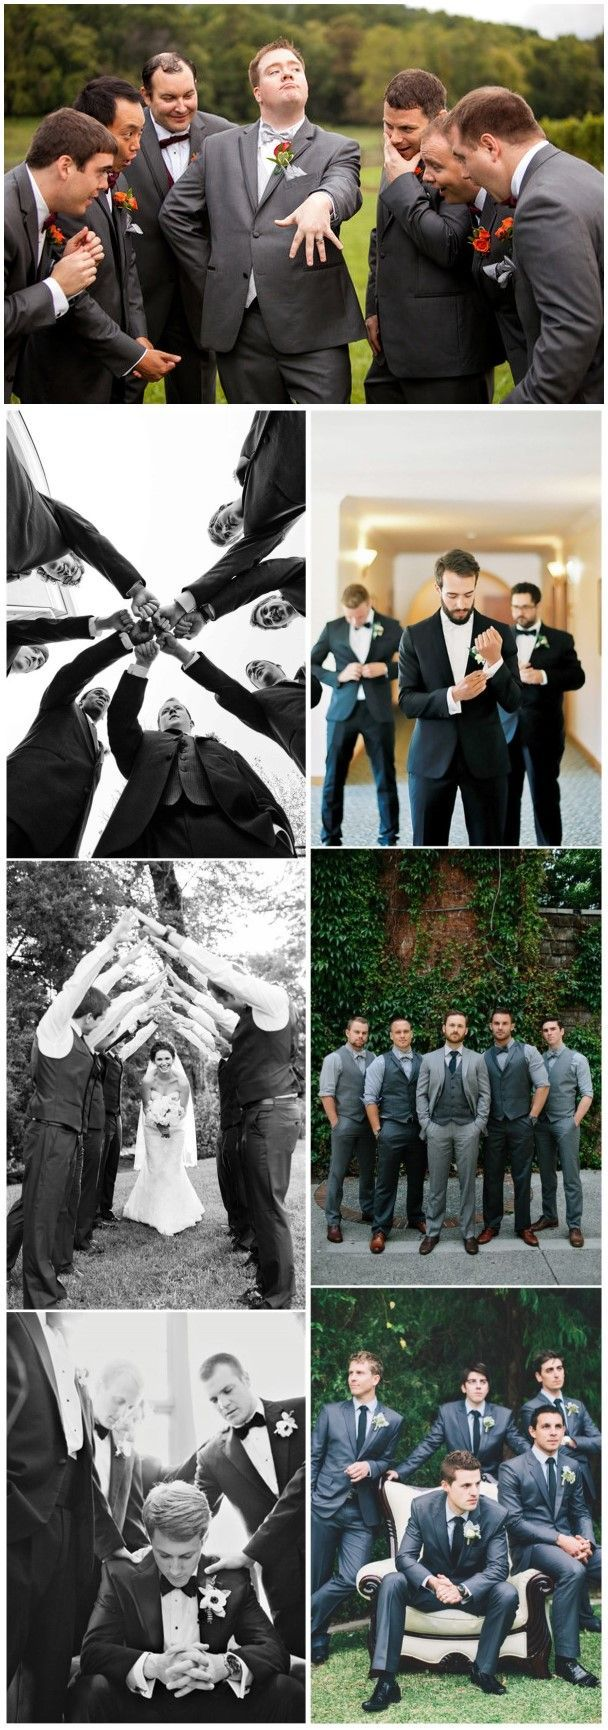 21 Must-have Groomsmen Photos Ideas to Make an Awesome Wedding #attireforwedding